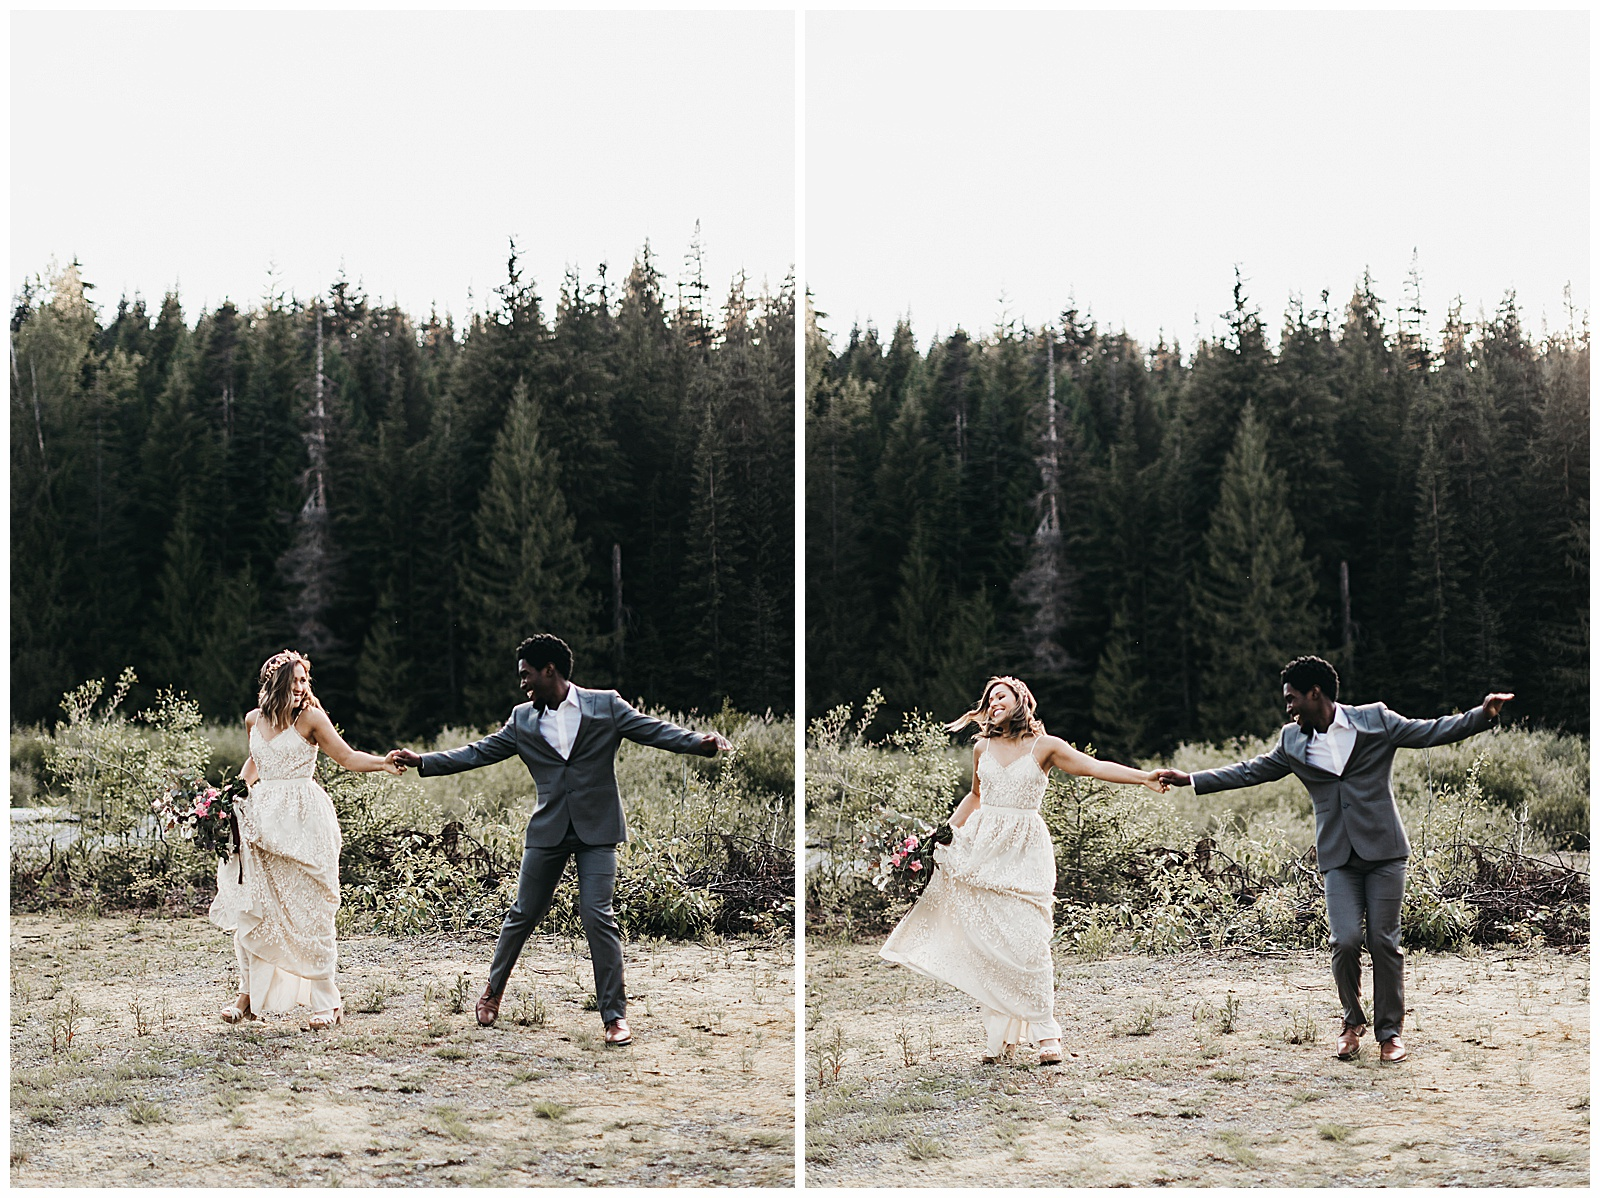 seattle-wedding-photographer-seattle-elopement-photographer-anniezav_0014.jpg